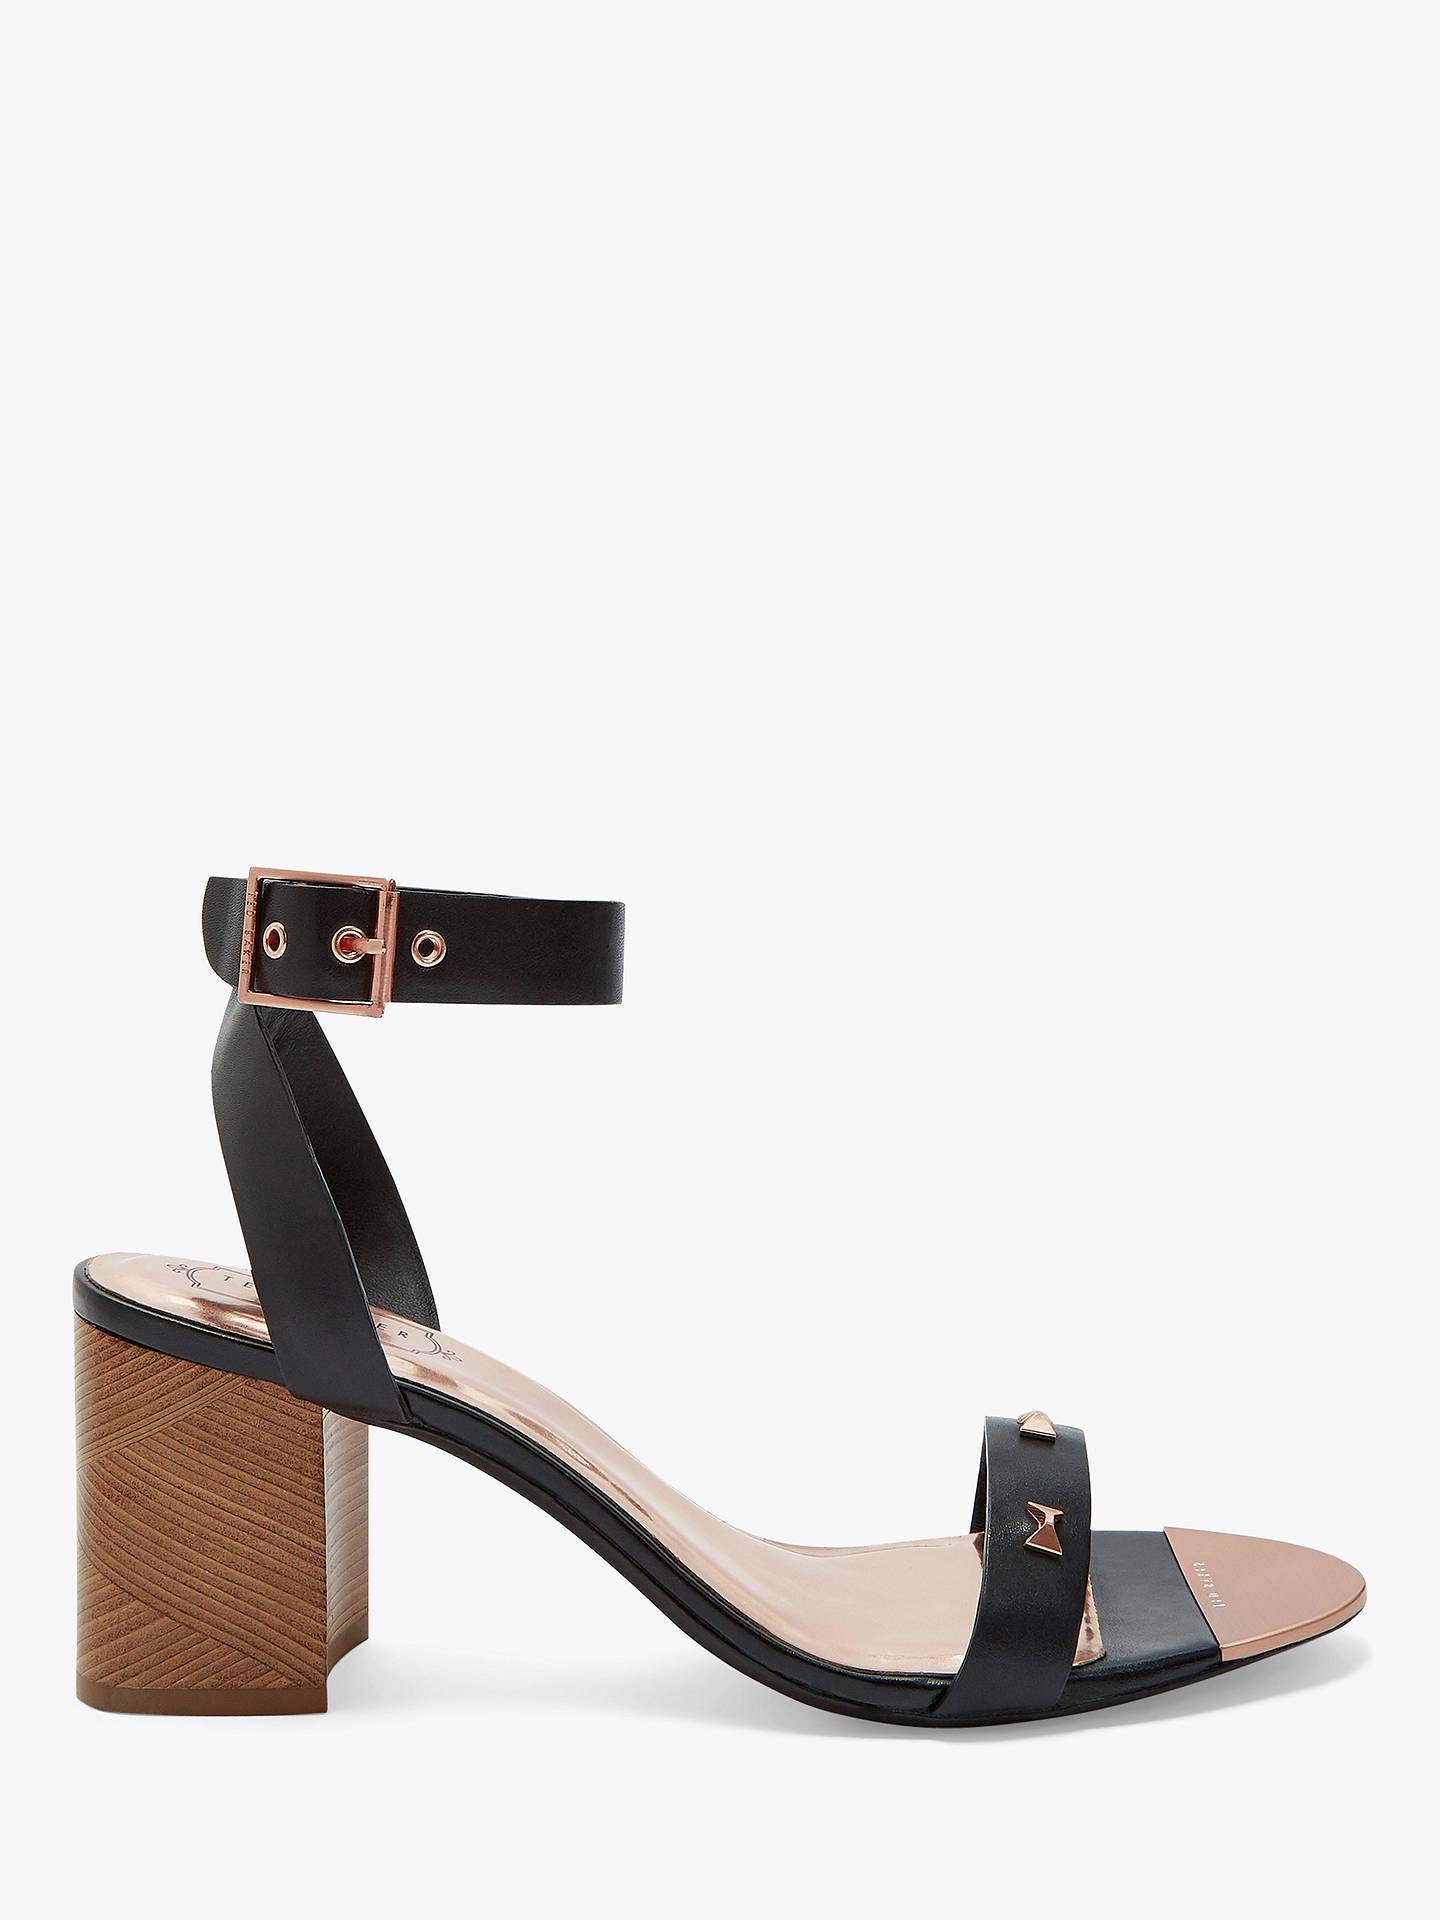 fd7cb7884cfe Ted Baker Biah Studded Block Heel Sandals at John Lewis   Partners